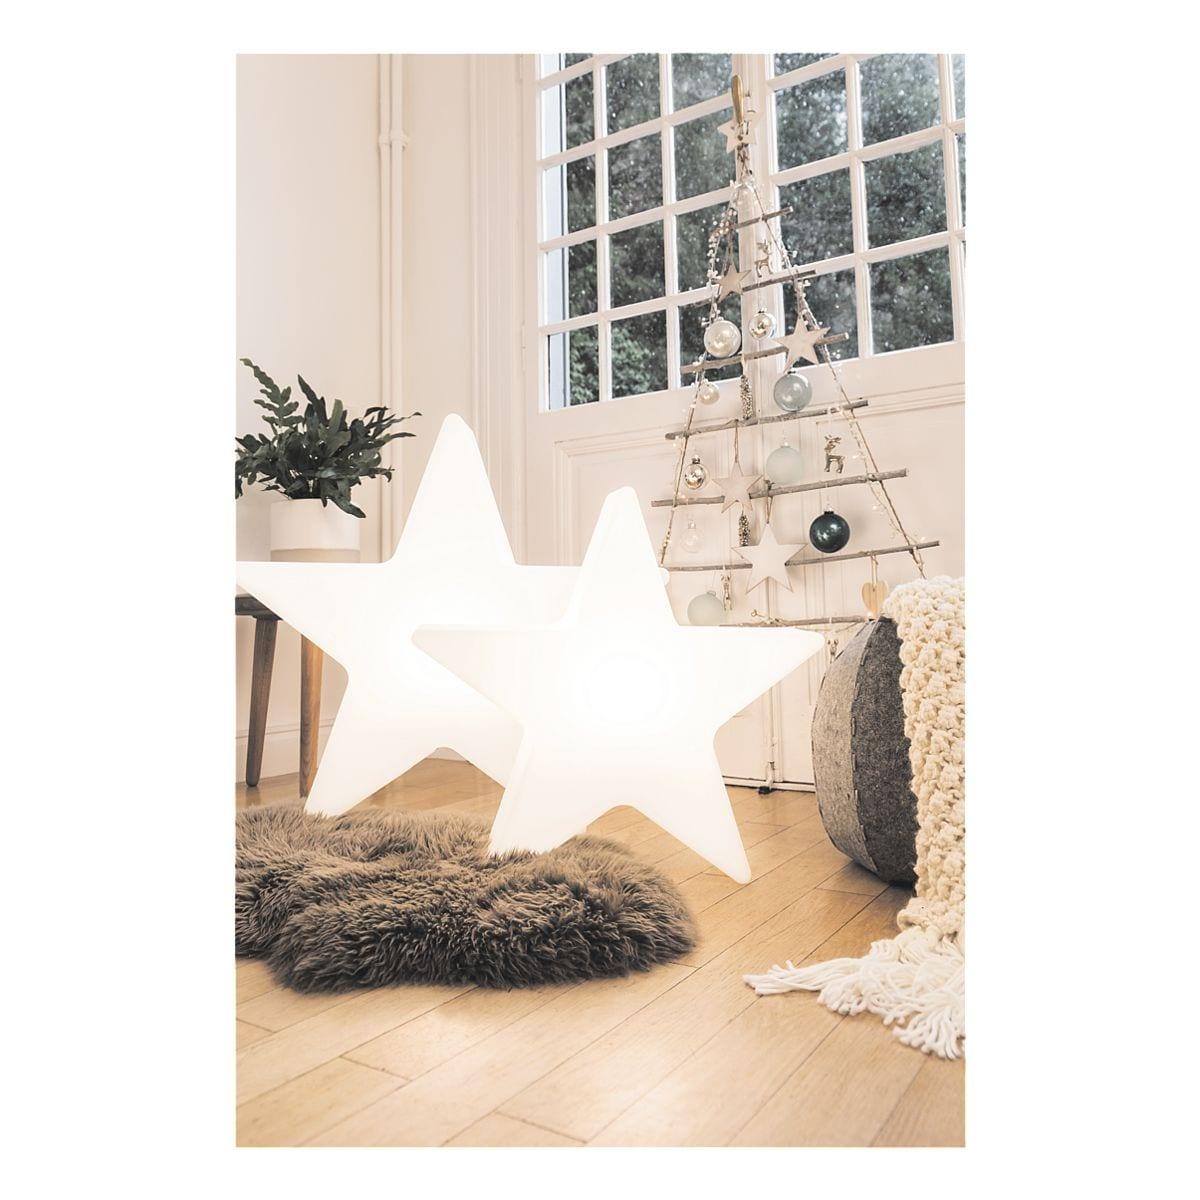 8 seasons weihnachtsbeleuchtung shining star bei otto office g nstig kaufen. Black Bedroom Furniture Sets. Home Design Ideas